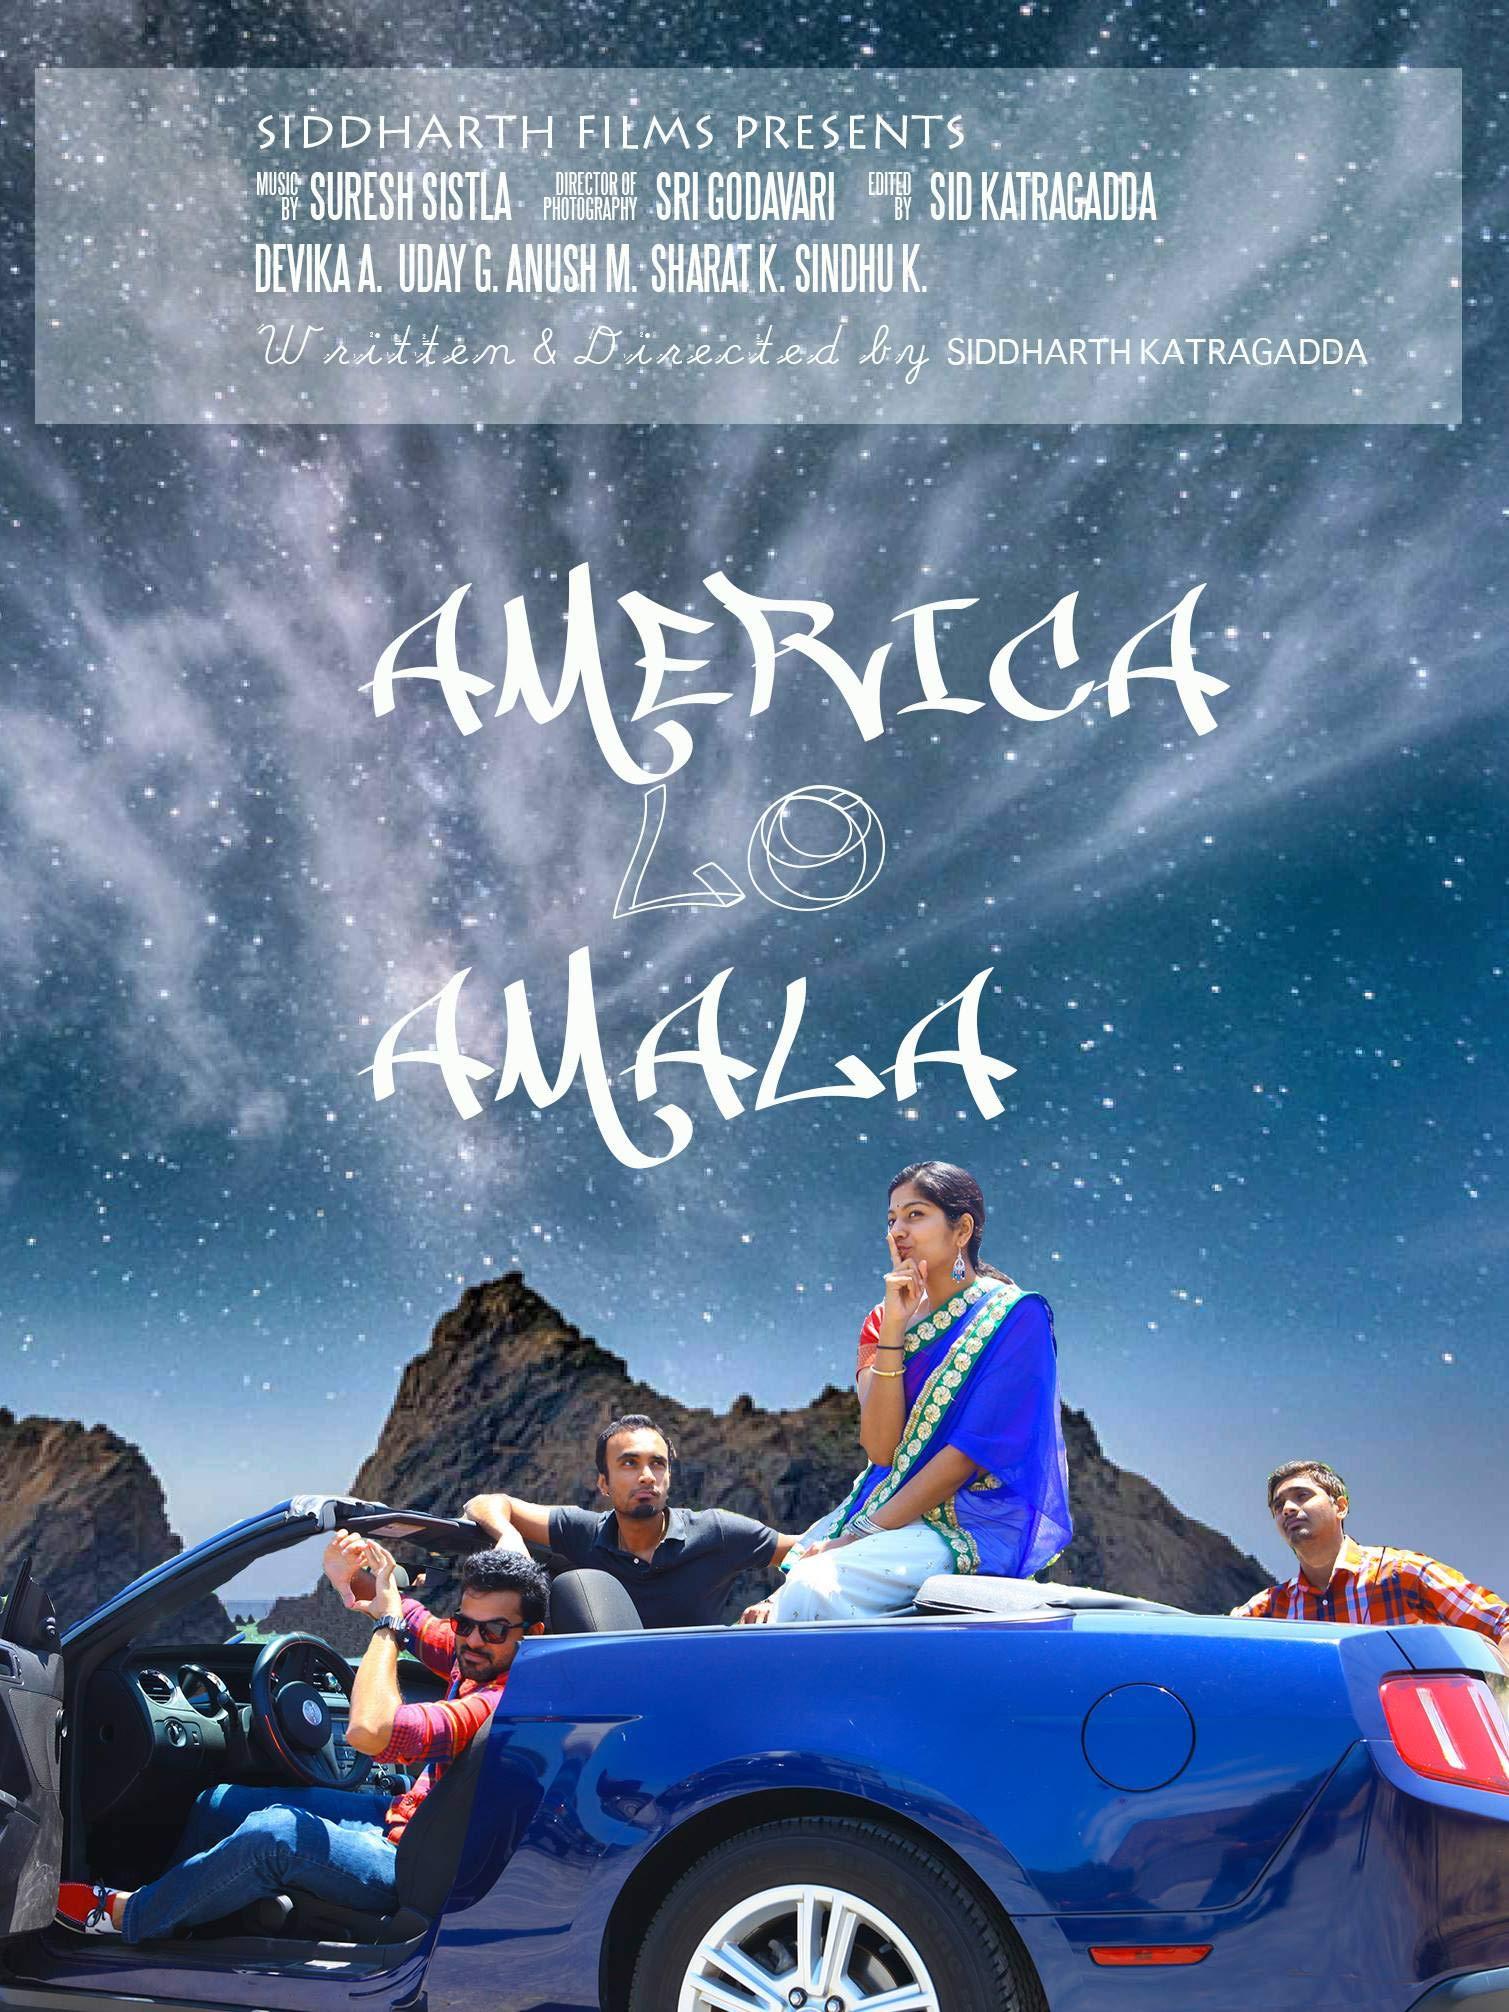 America Lo Amala (Amala in America)